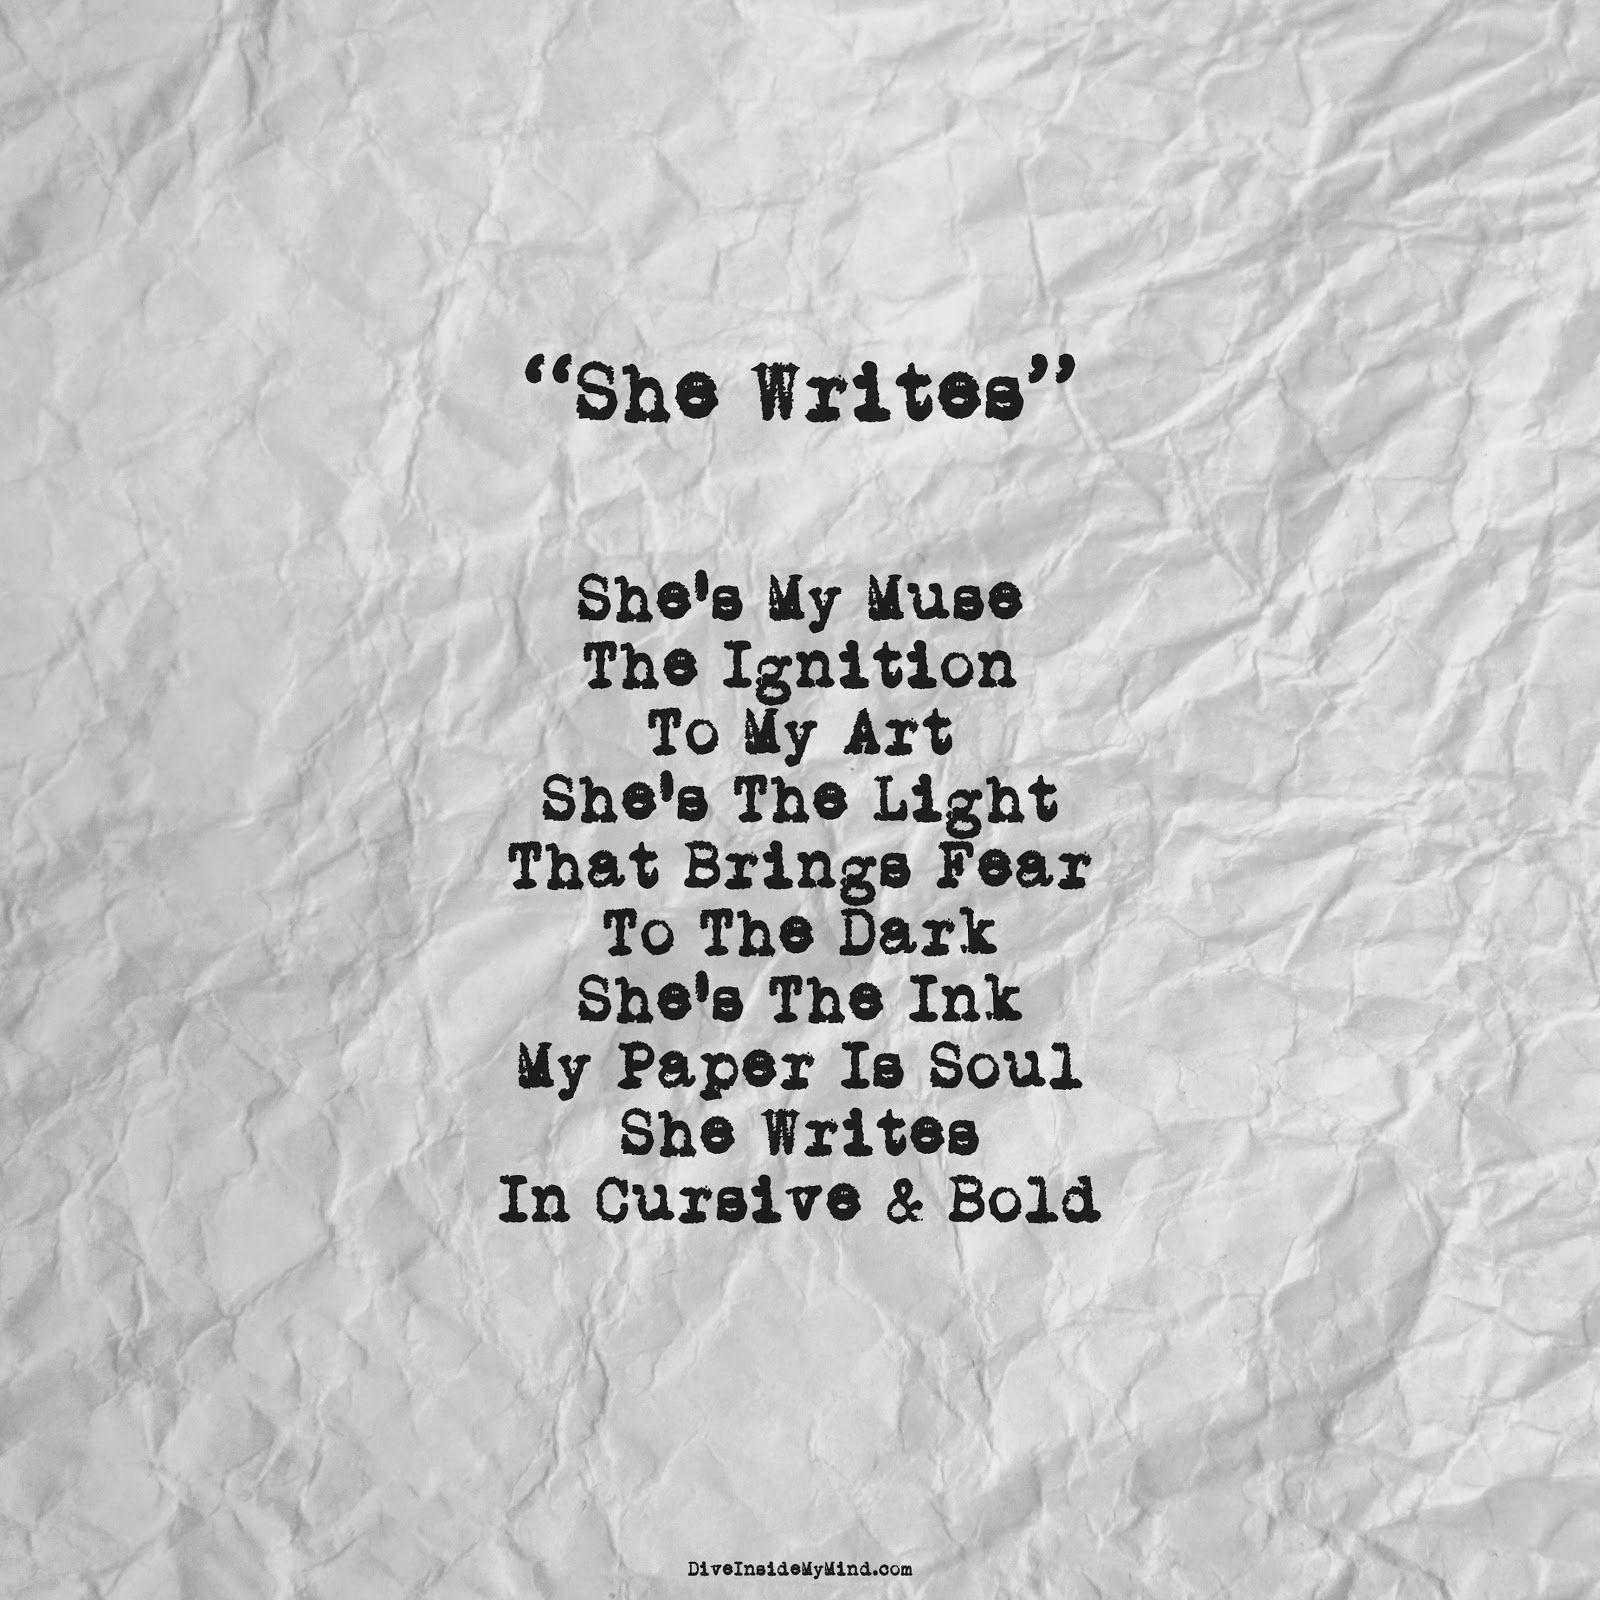 She Writes Writing Cursive Writing Poetic Words